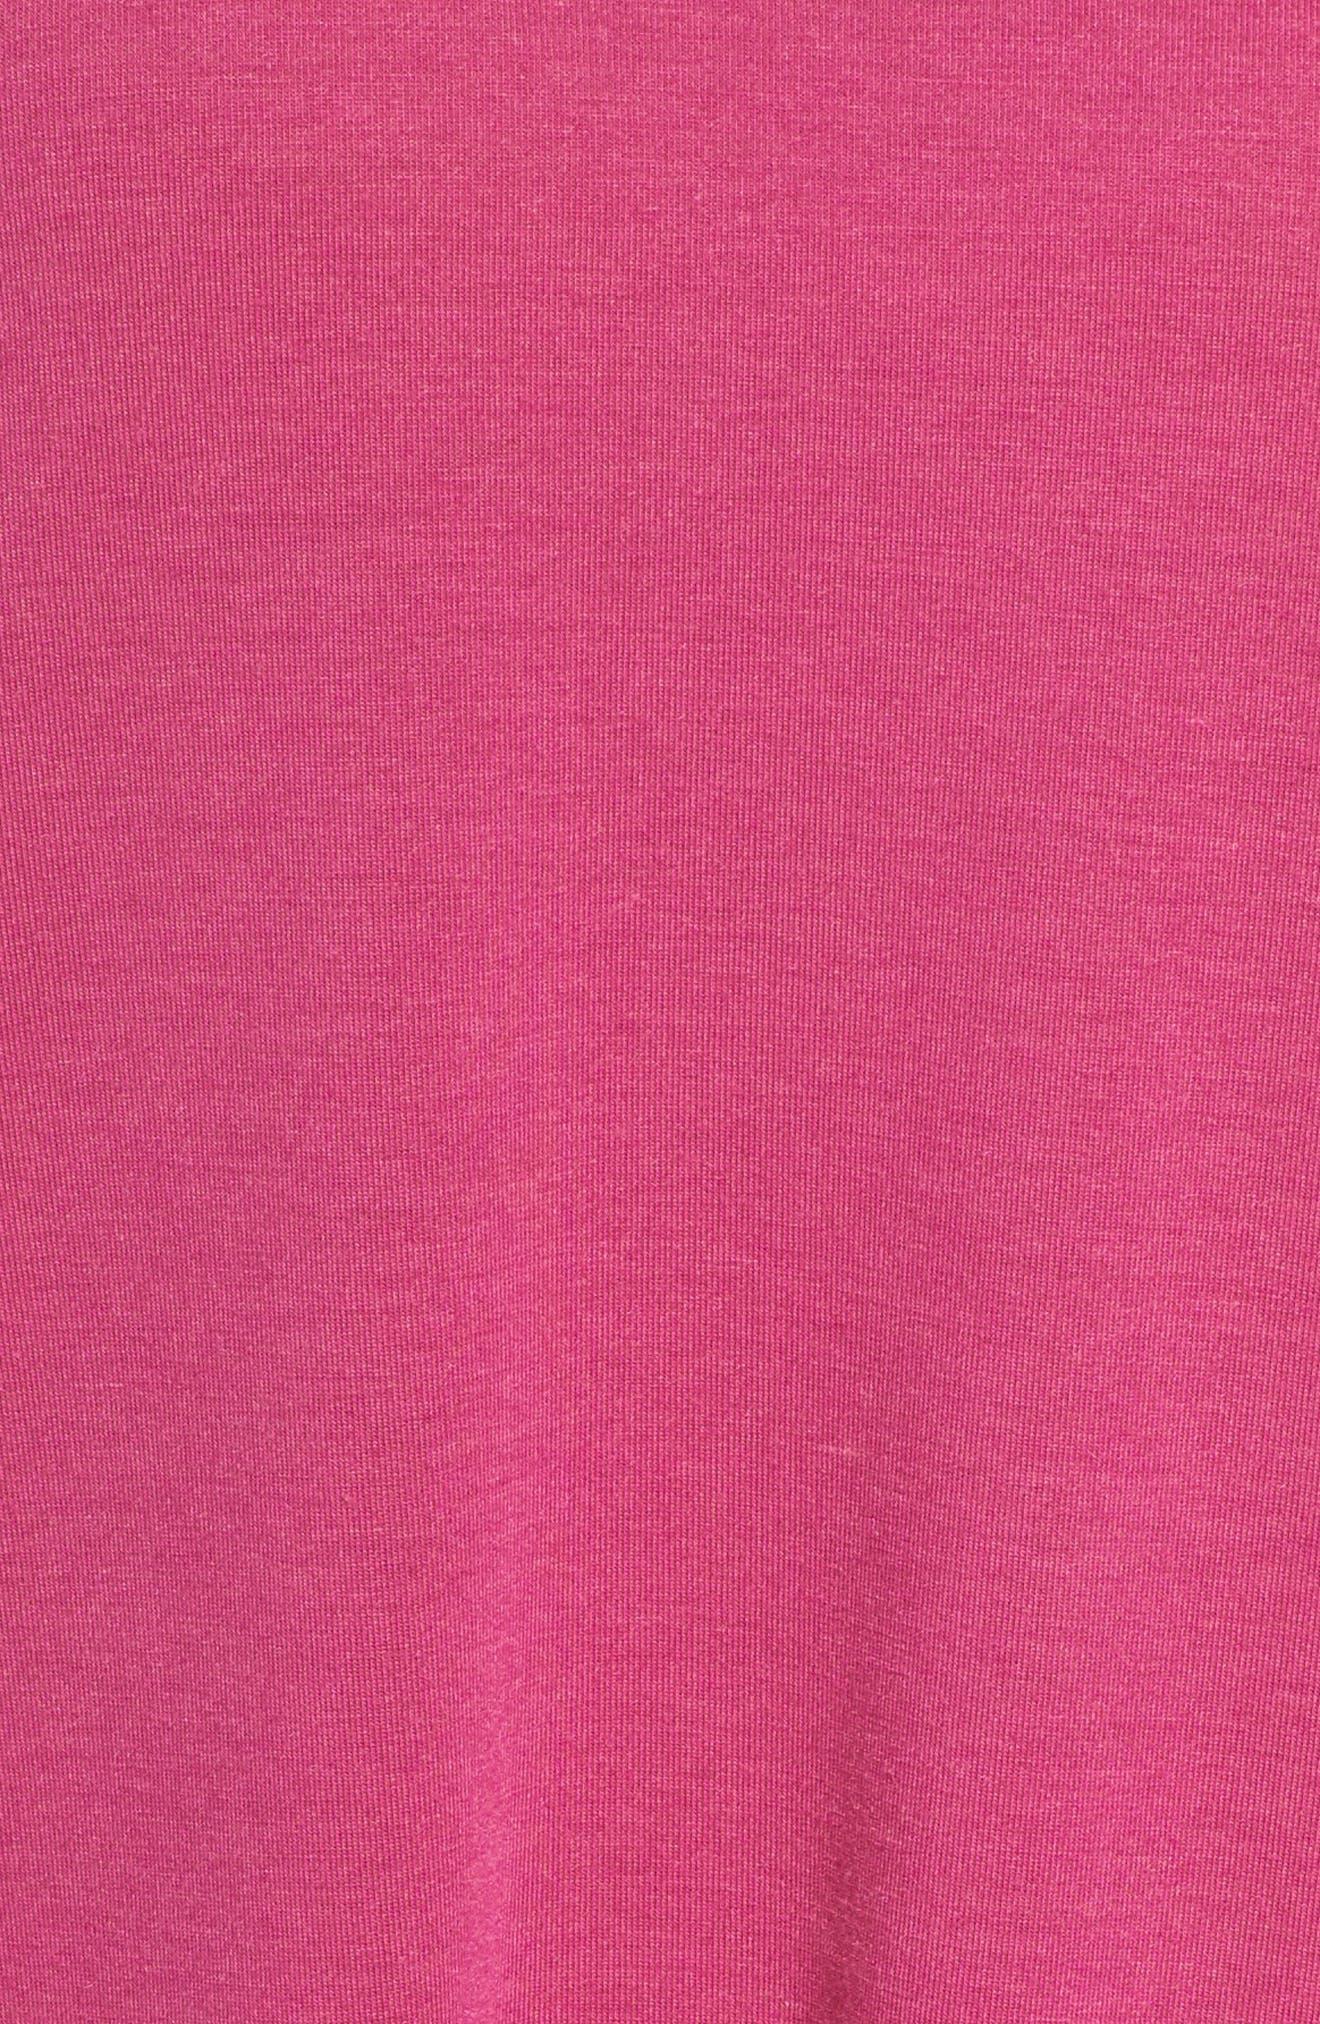 Honeydew All American Sleep Shirt,                             Alternate thumbnail 35, color,